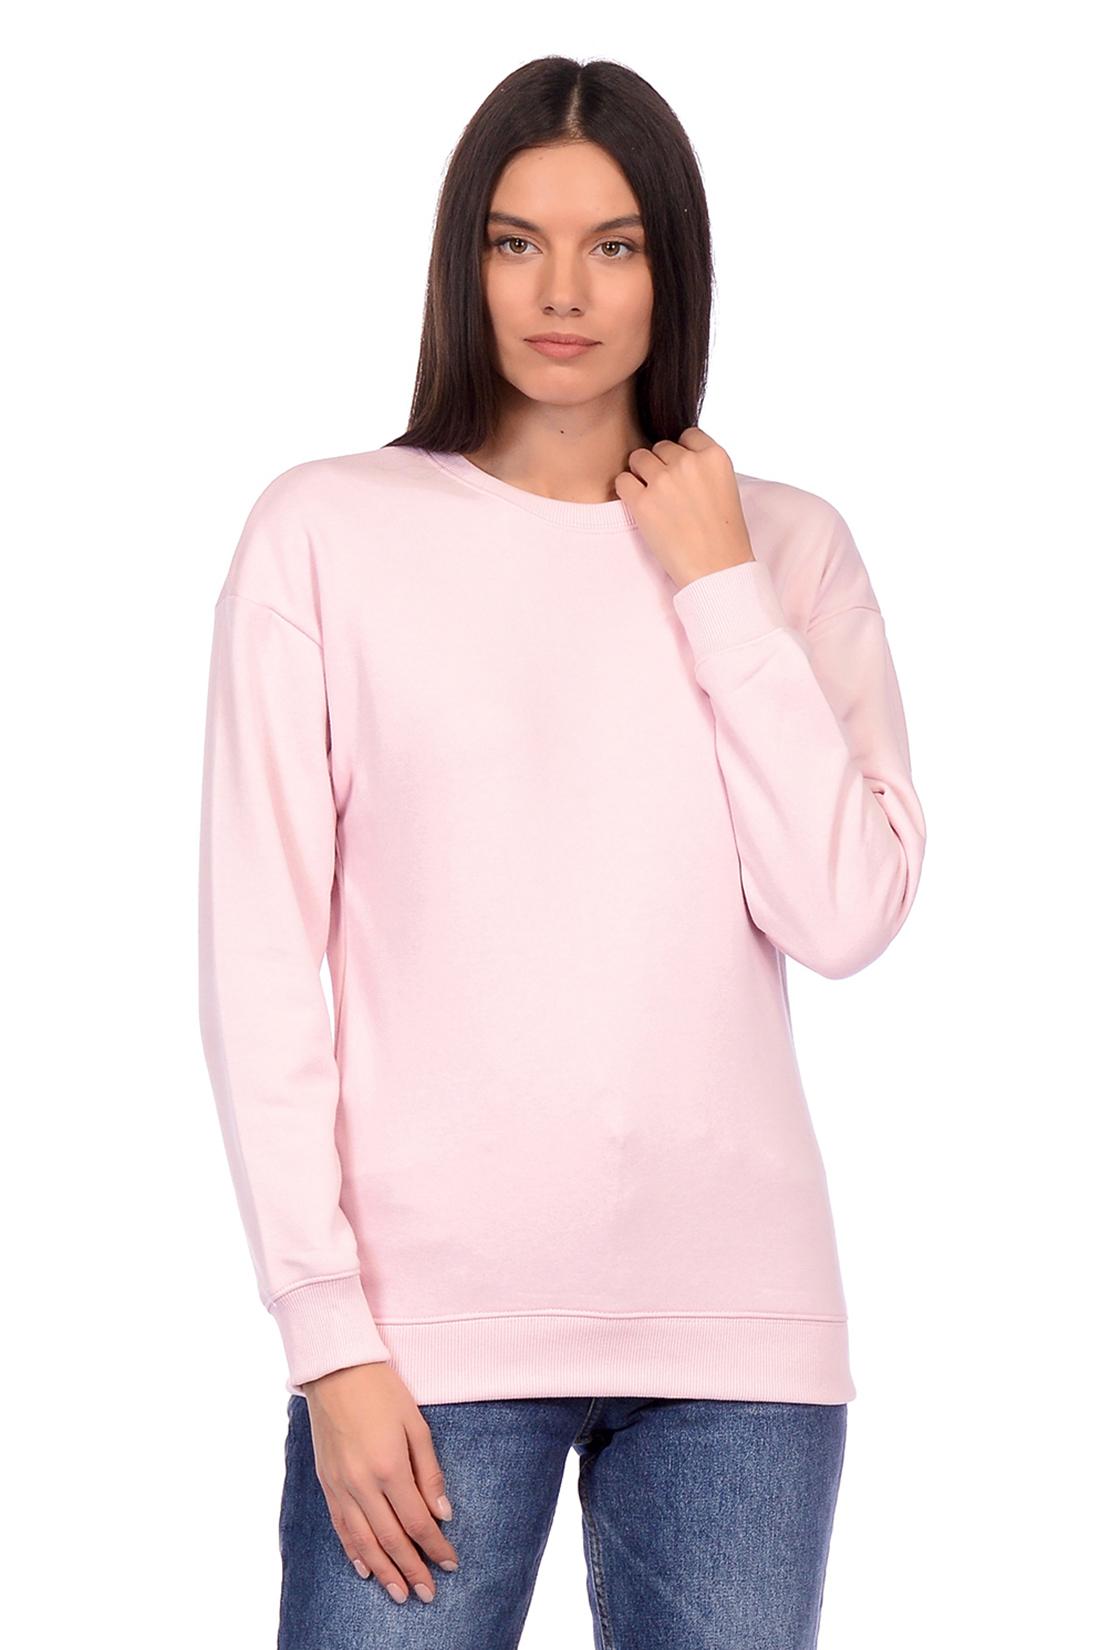 Свитшот женский Hailys hailys K016293 розовый L